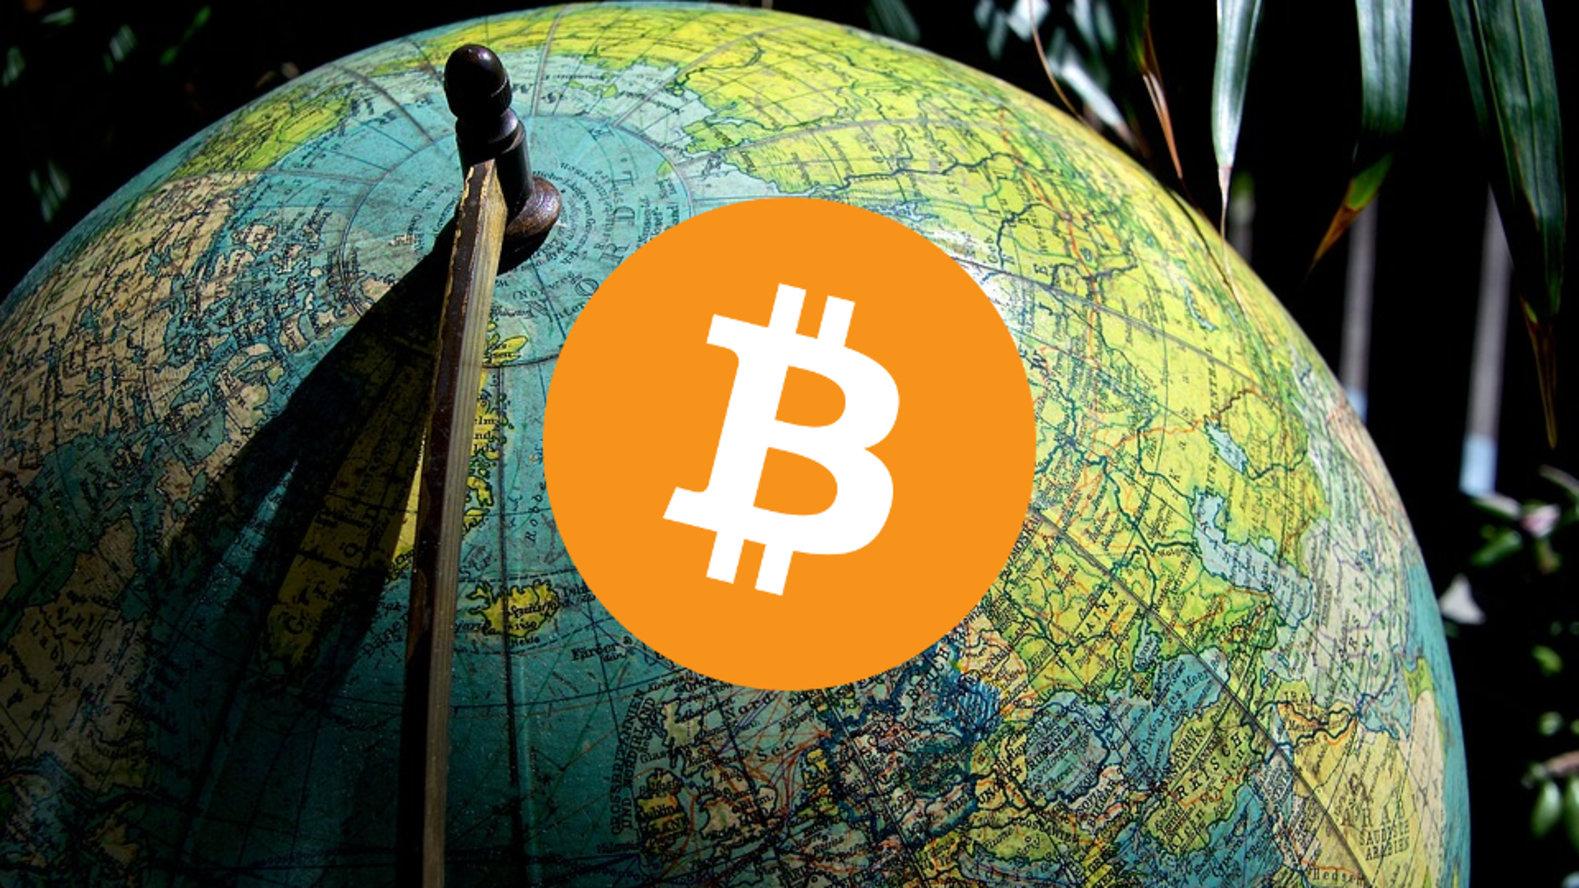 adoption of cryptos in the world